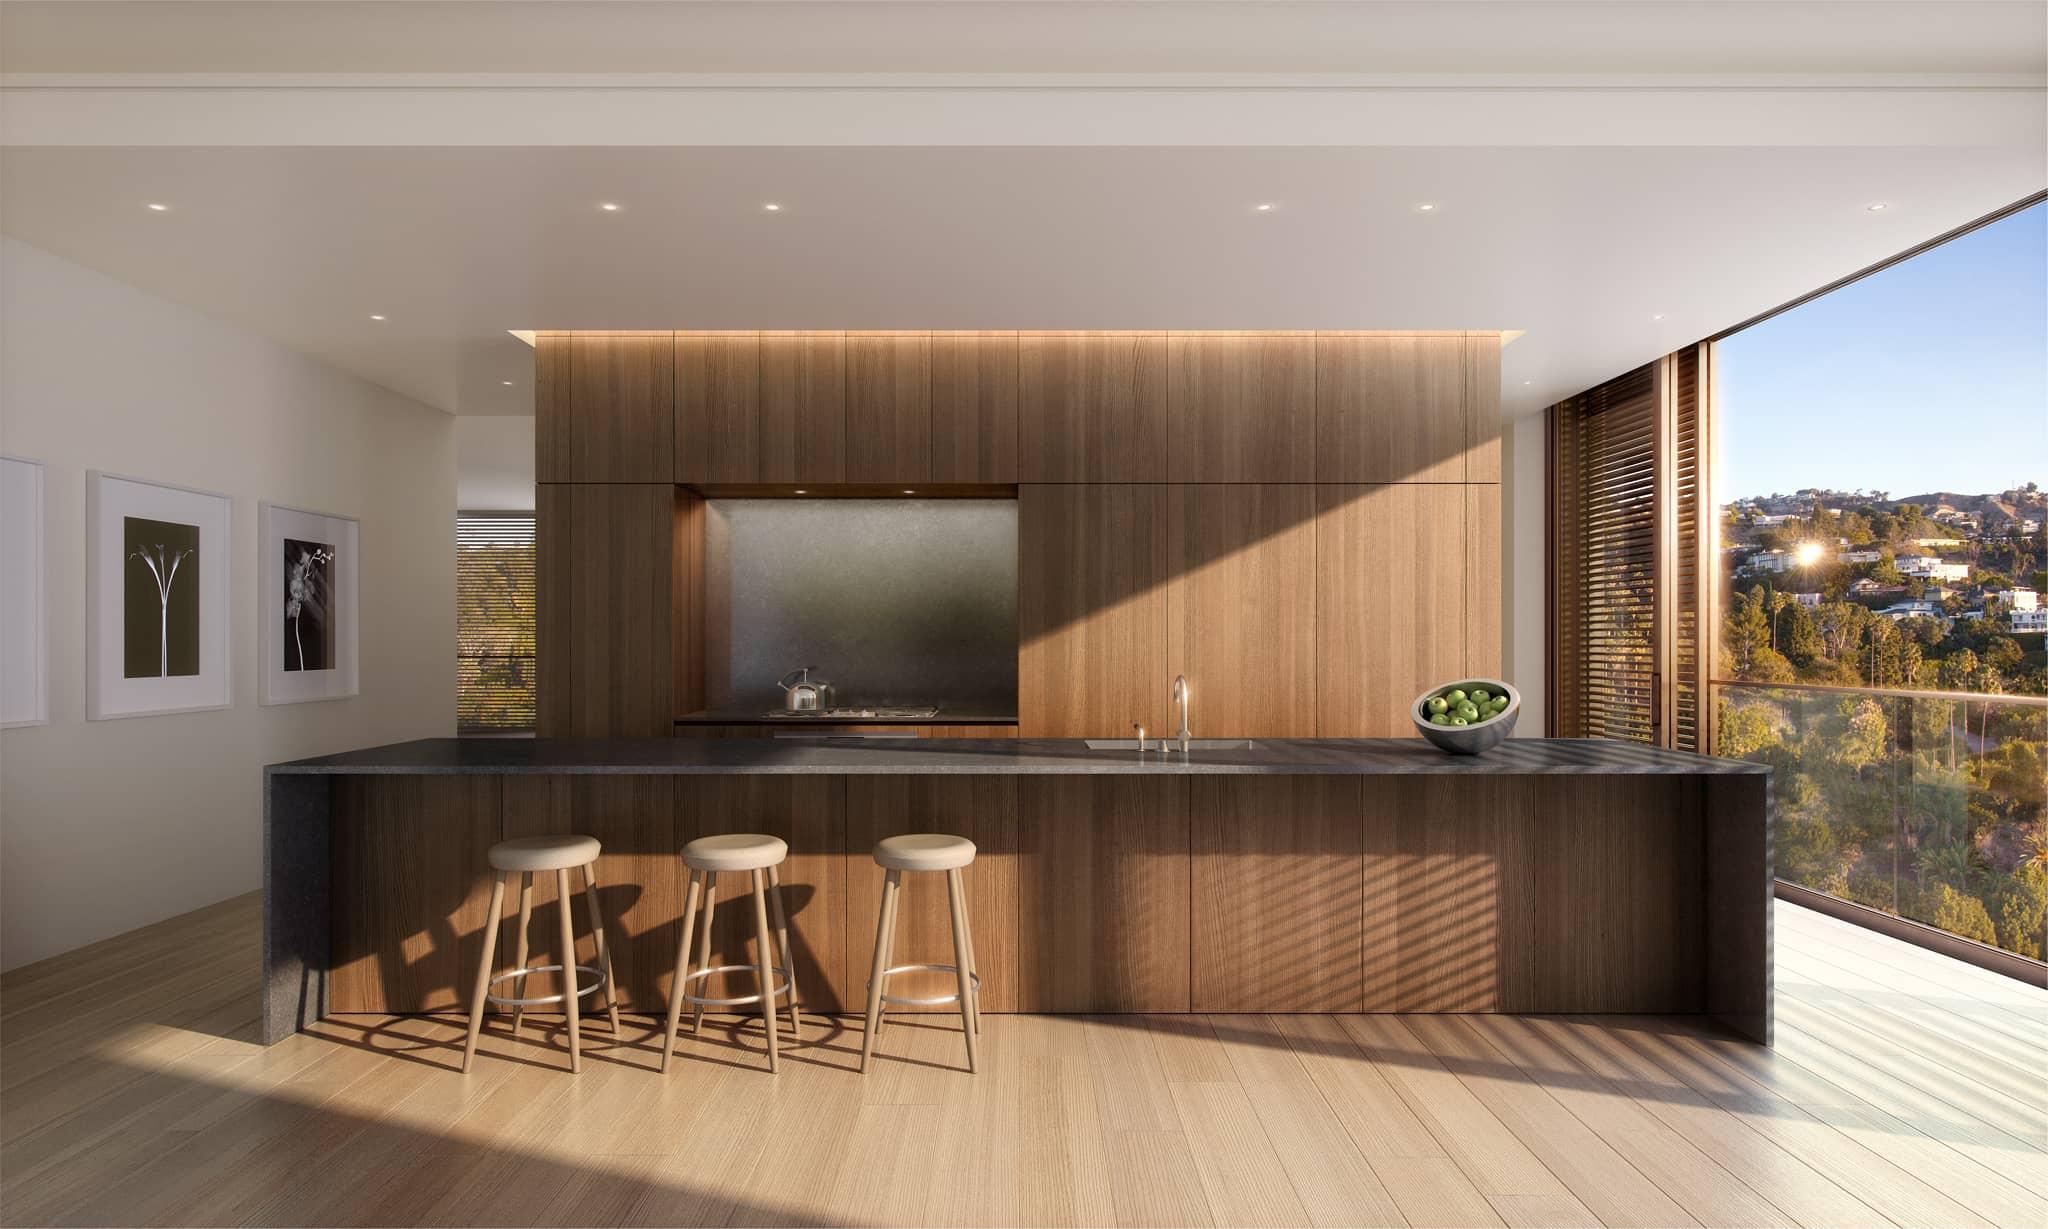 Molteni kitchens by John Pawson